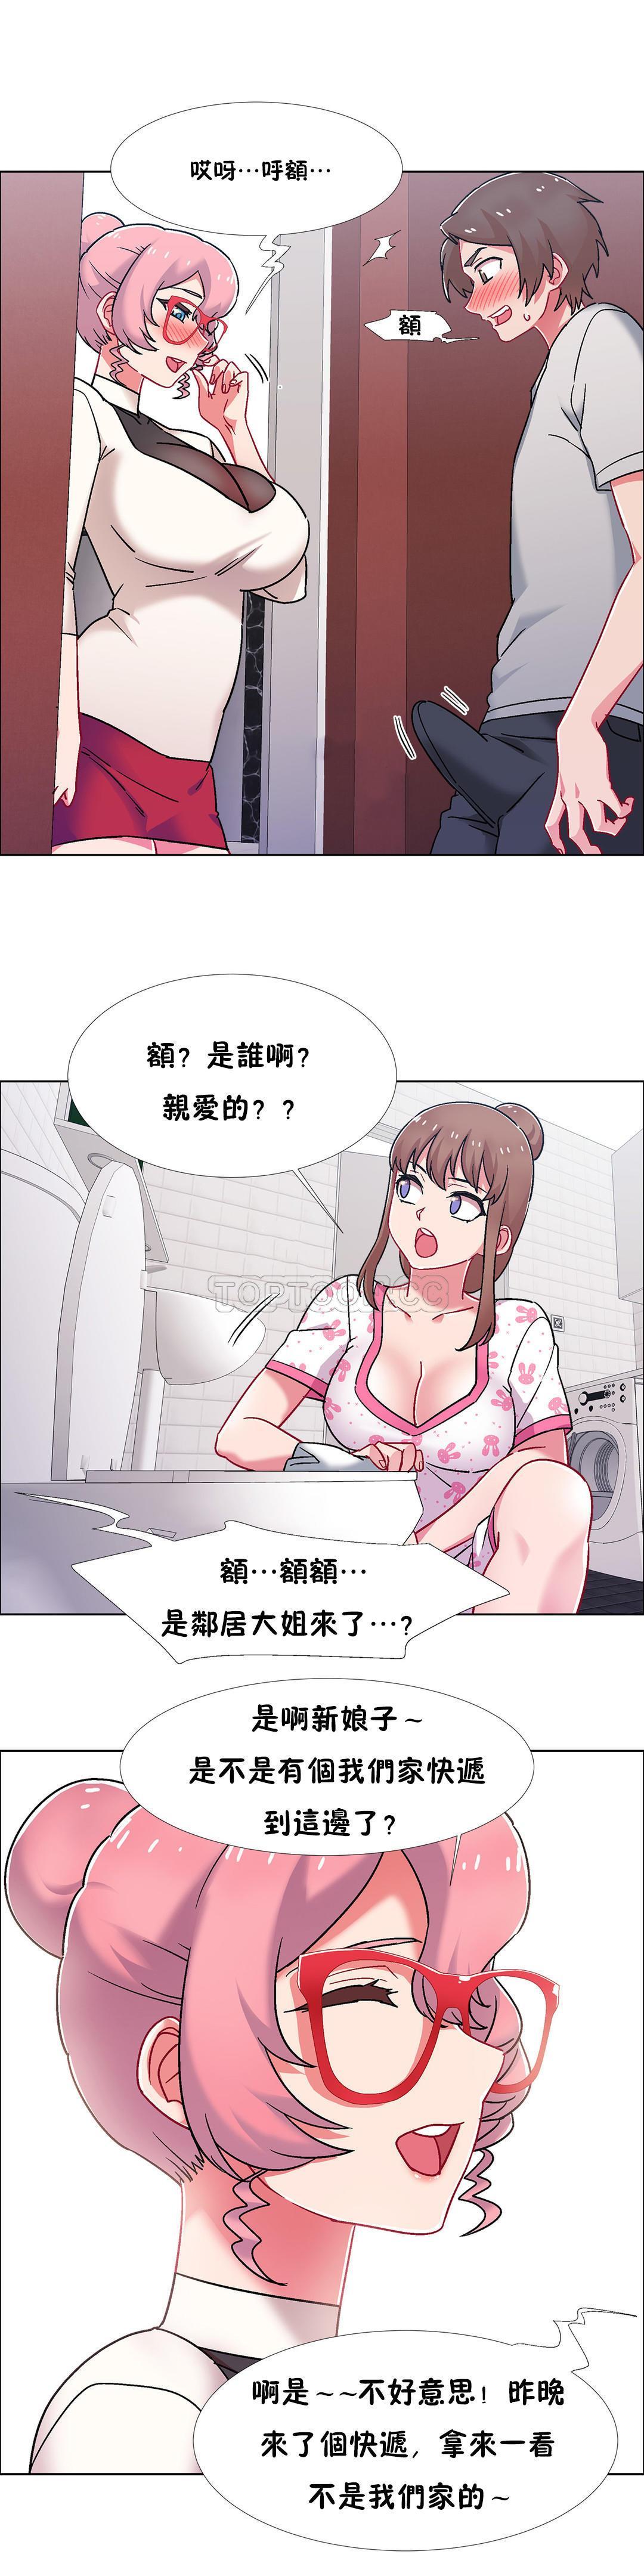 [Studio Wannabe] Rental Girls | 出租女郎 Ch. 33-58 [Chinese]  第二季 完结 471